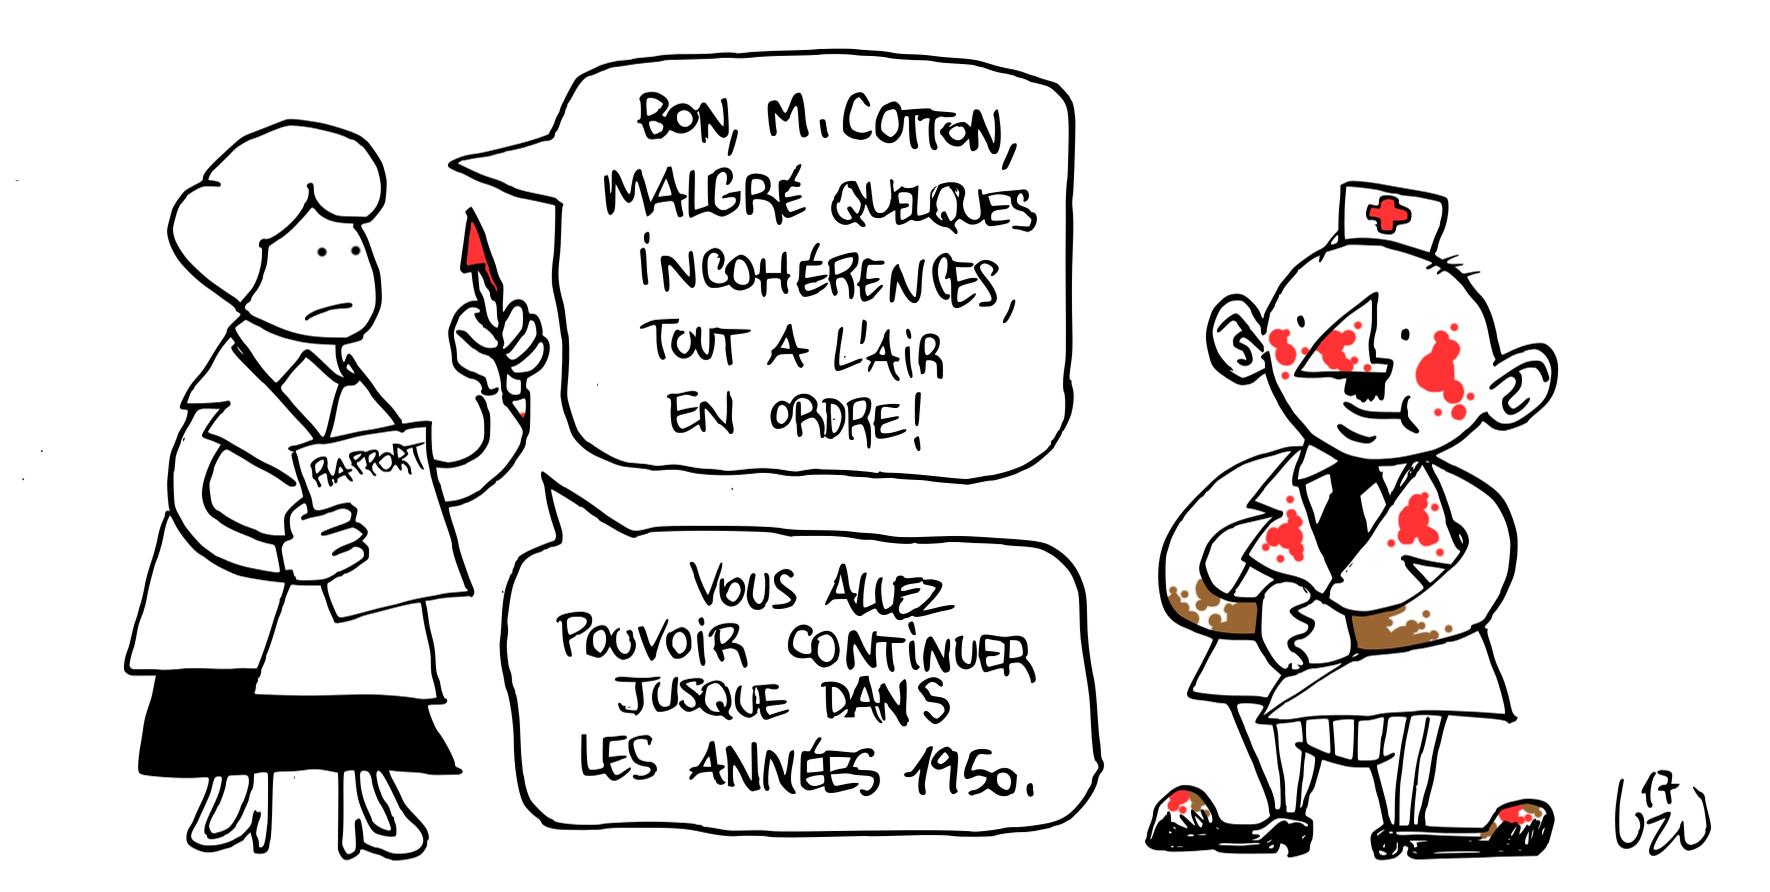 henry cotton 6